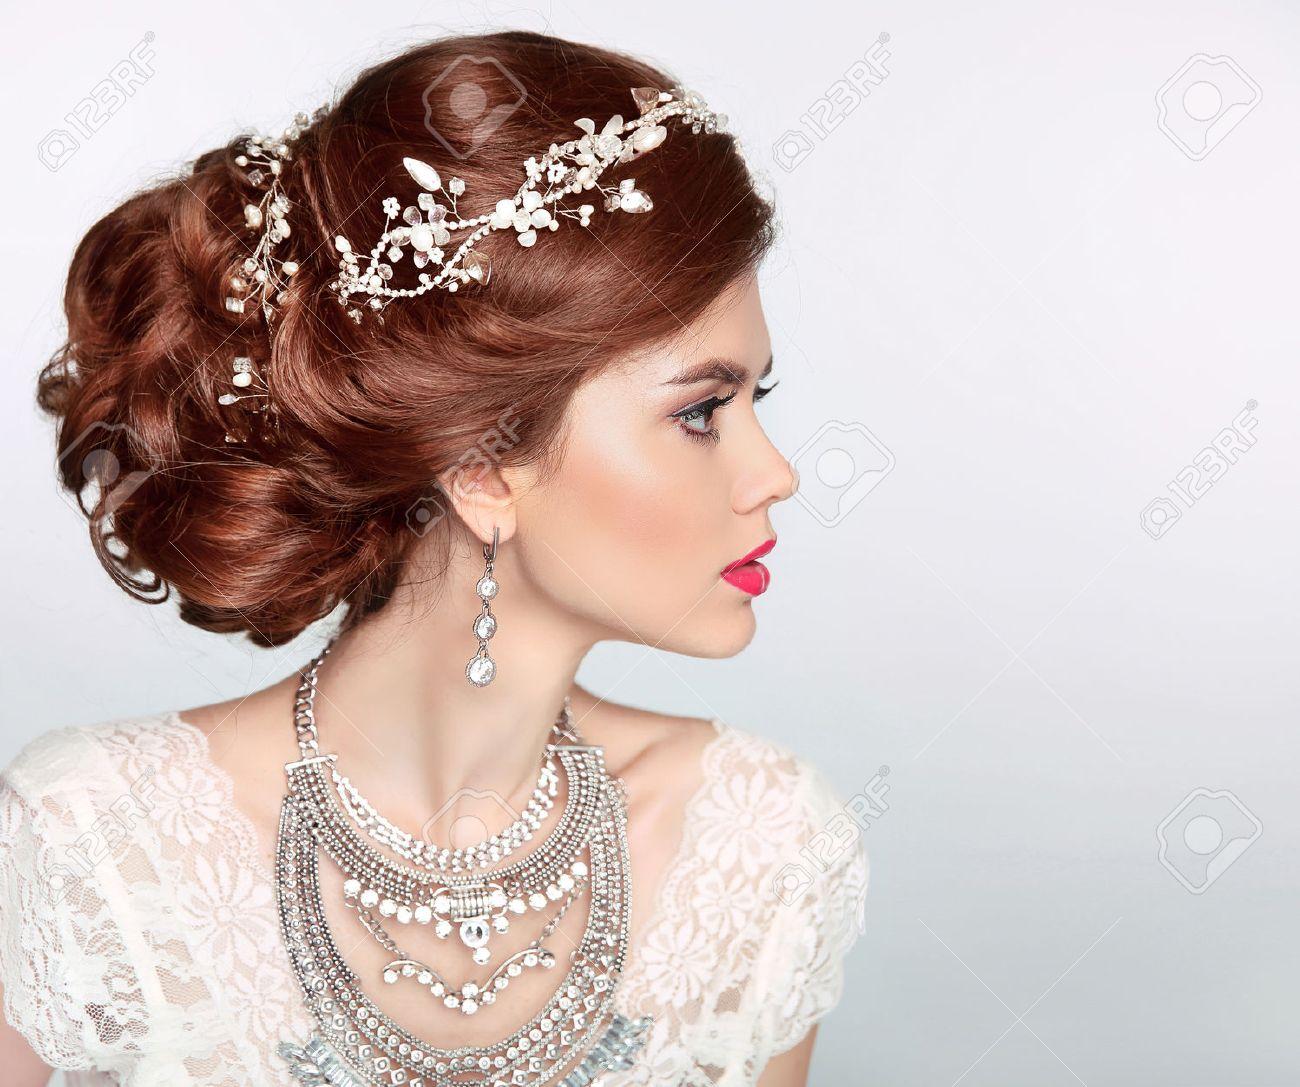 wedding hairstyle. beautiful fashion bride girl model portrait